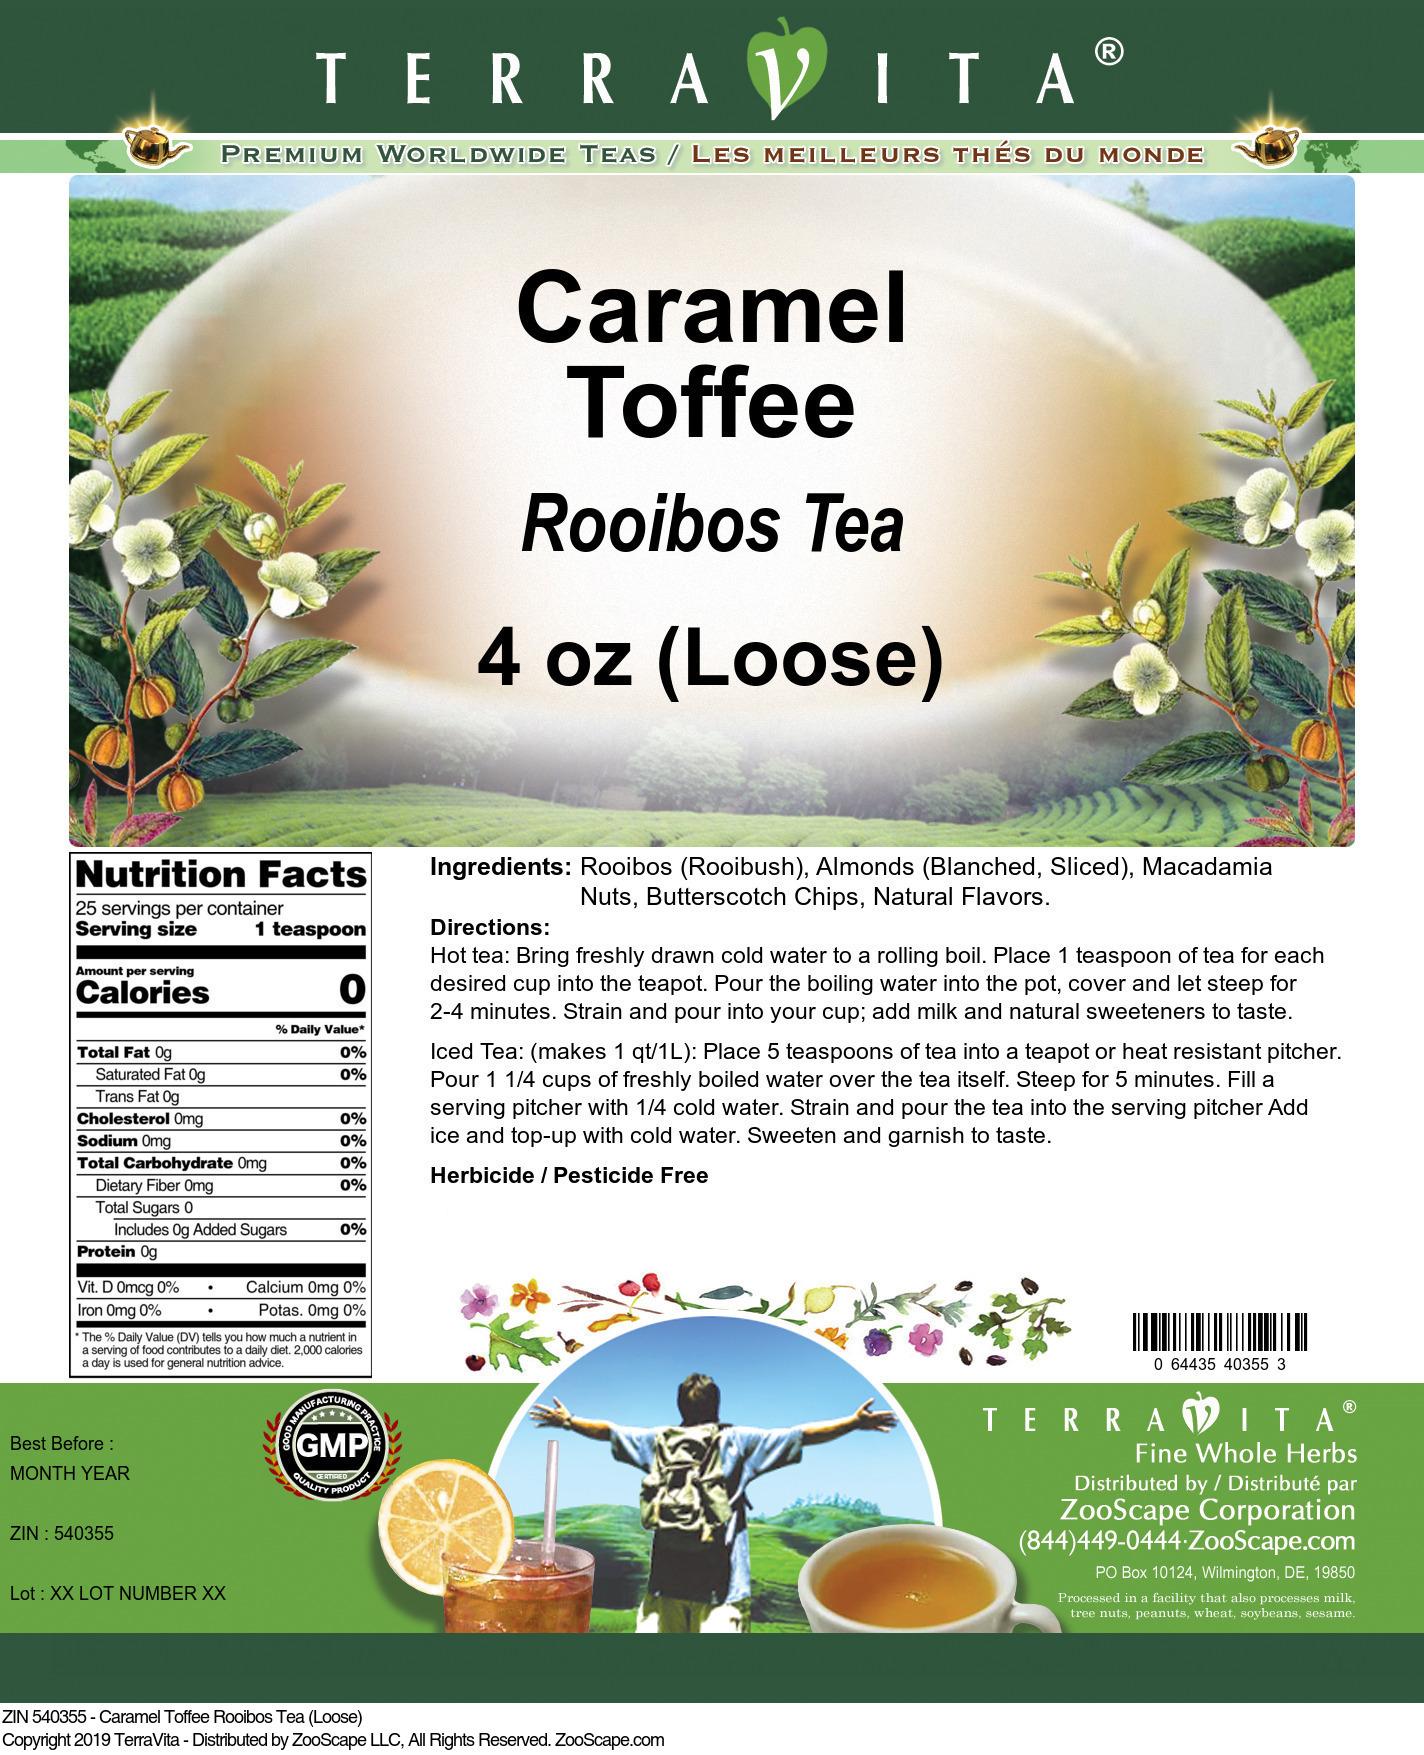 Caramel Toffee Rooibos Tea (Loose)